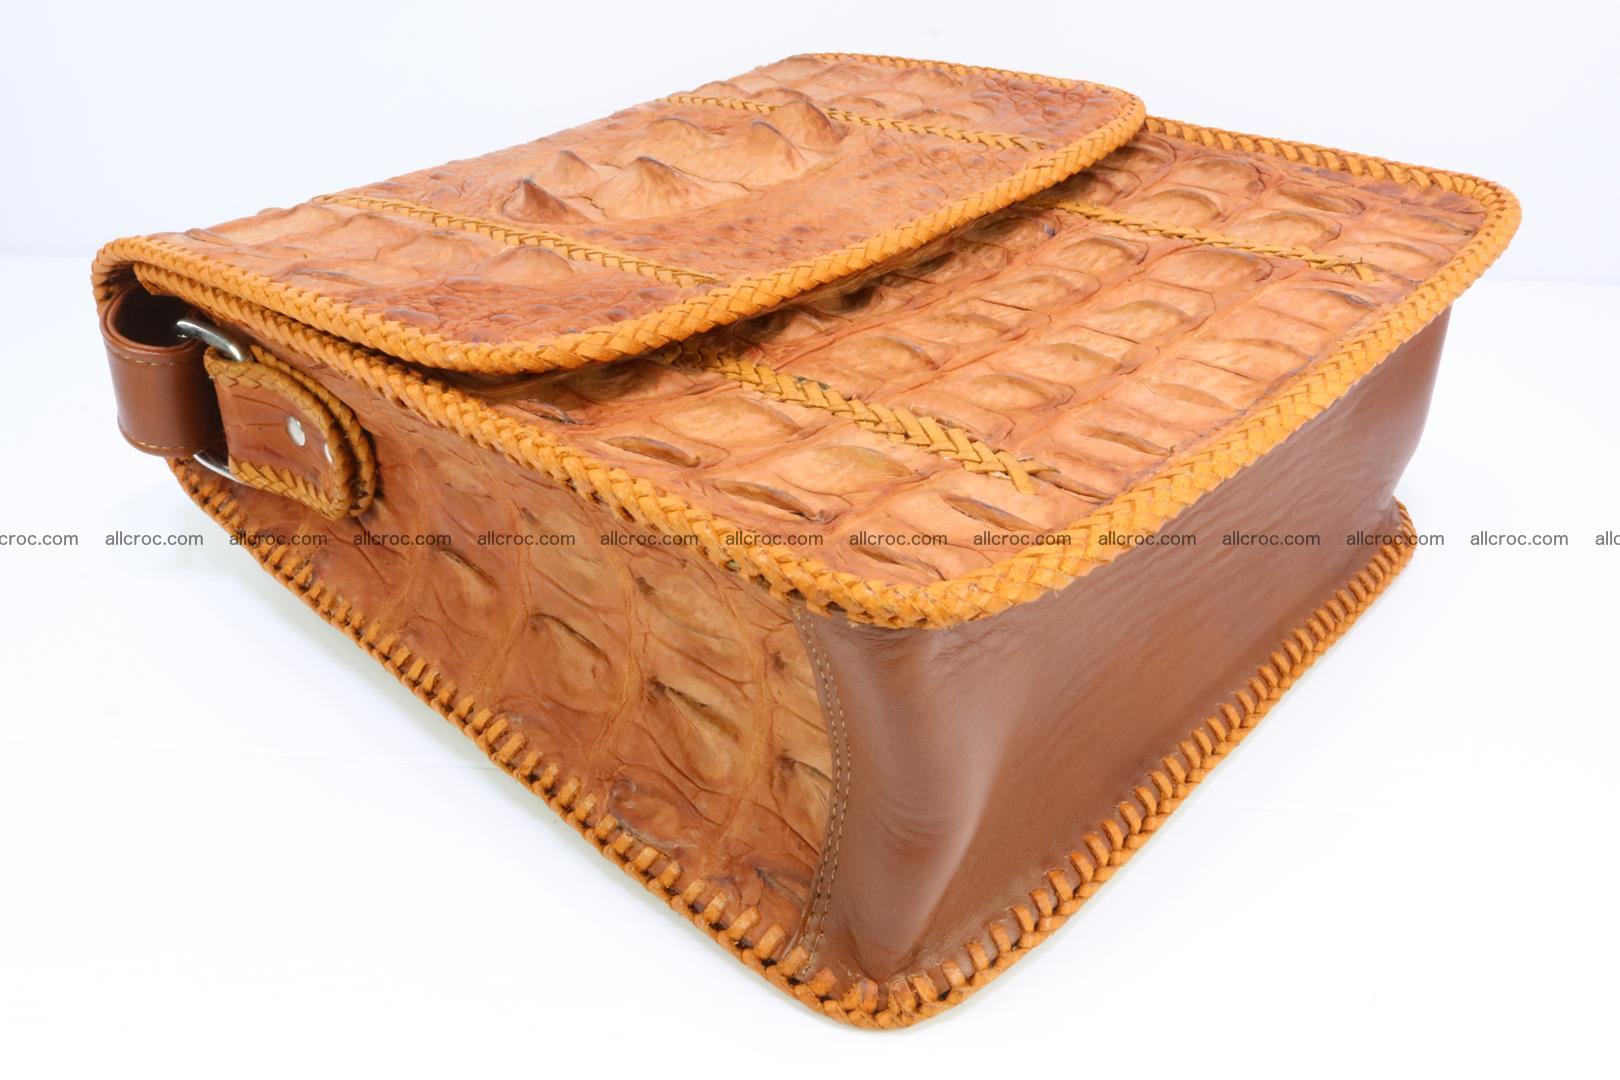 Сrocodile skin shoulder bag with braided edges 141 Foto 9